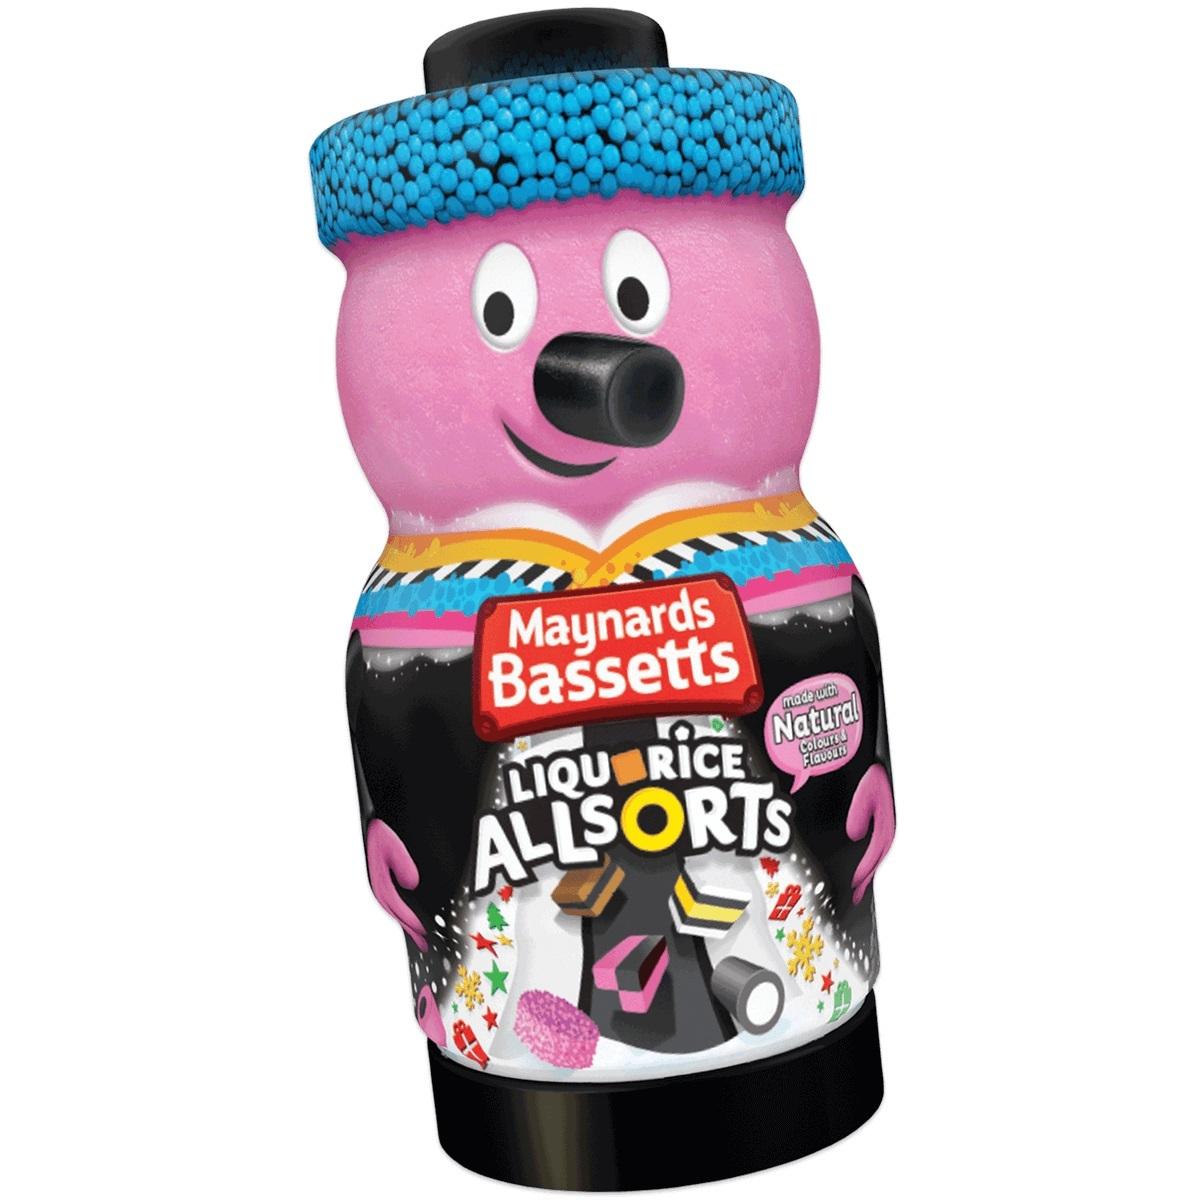 Bassetts Liquorice Allsorts Character Jar (495g) image